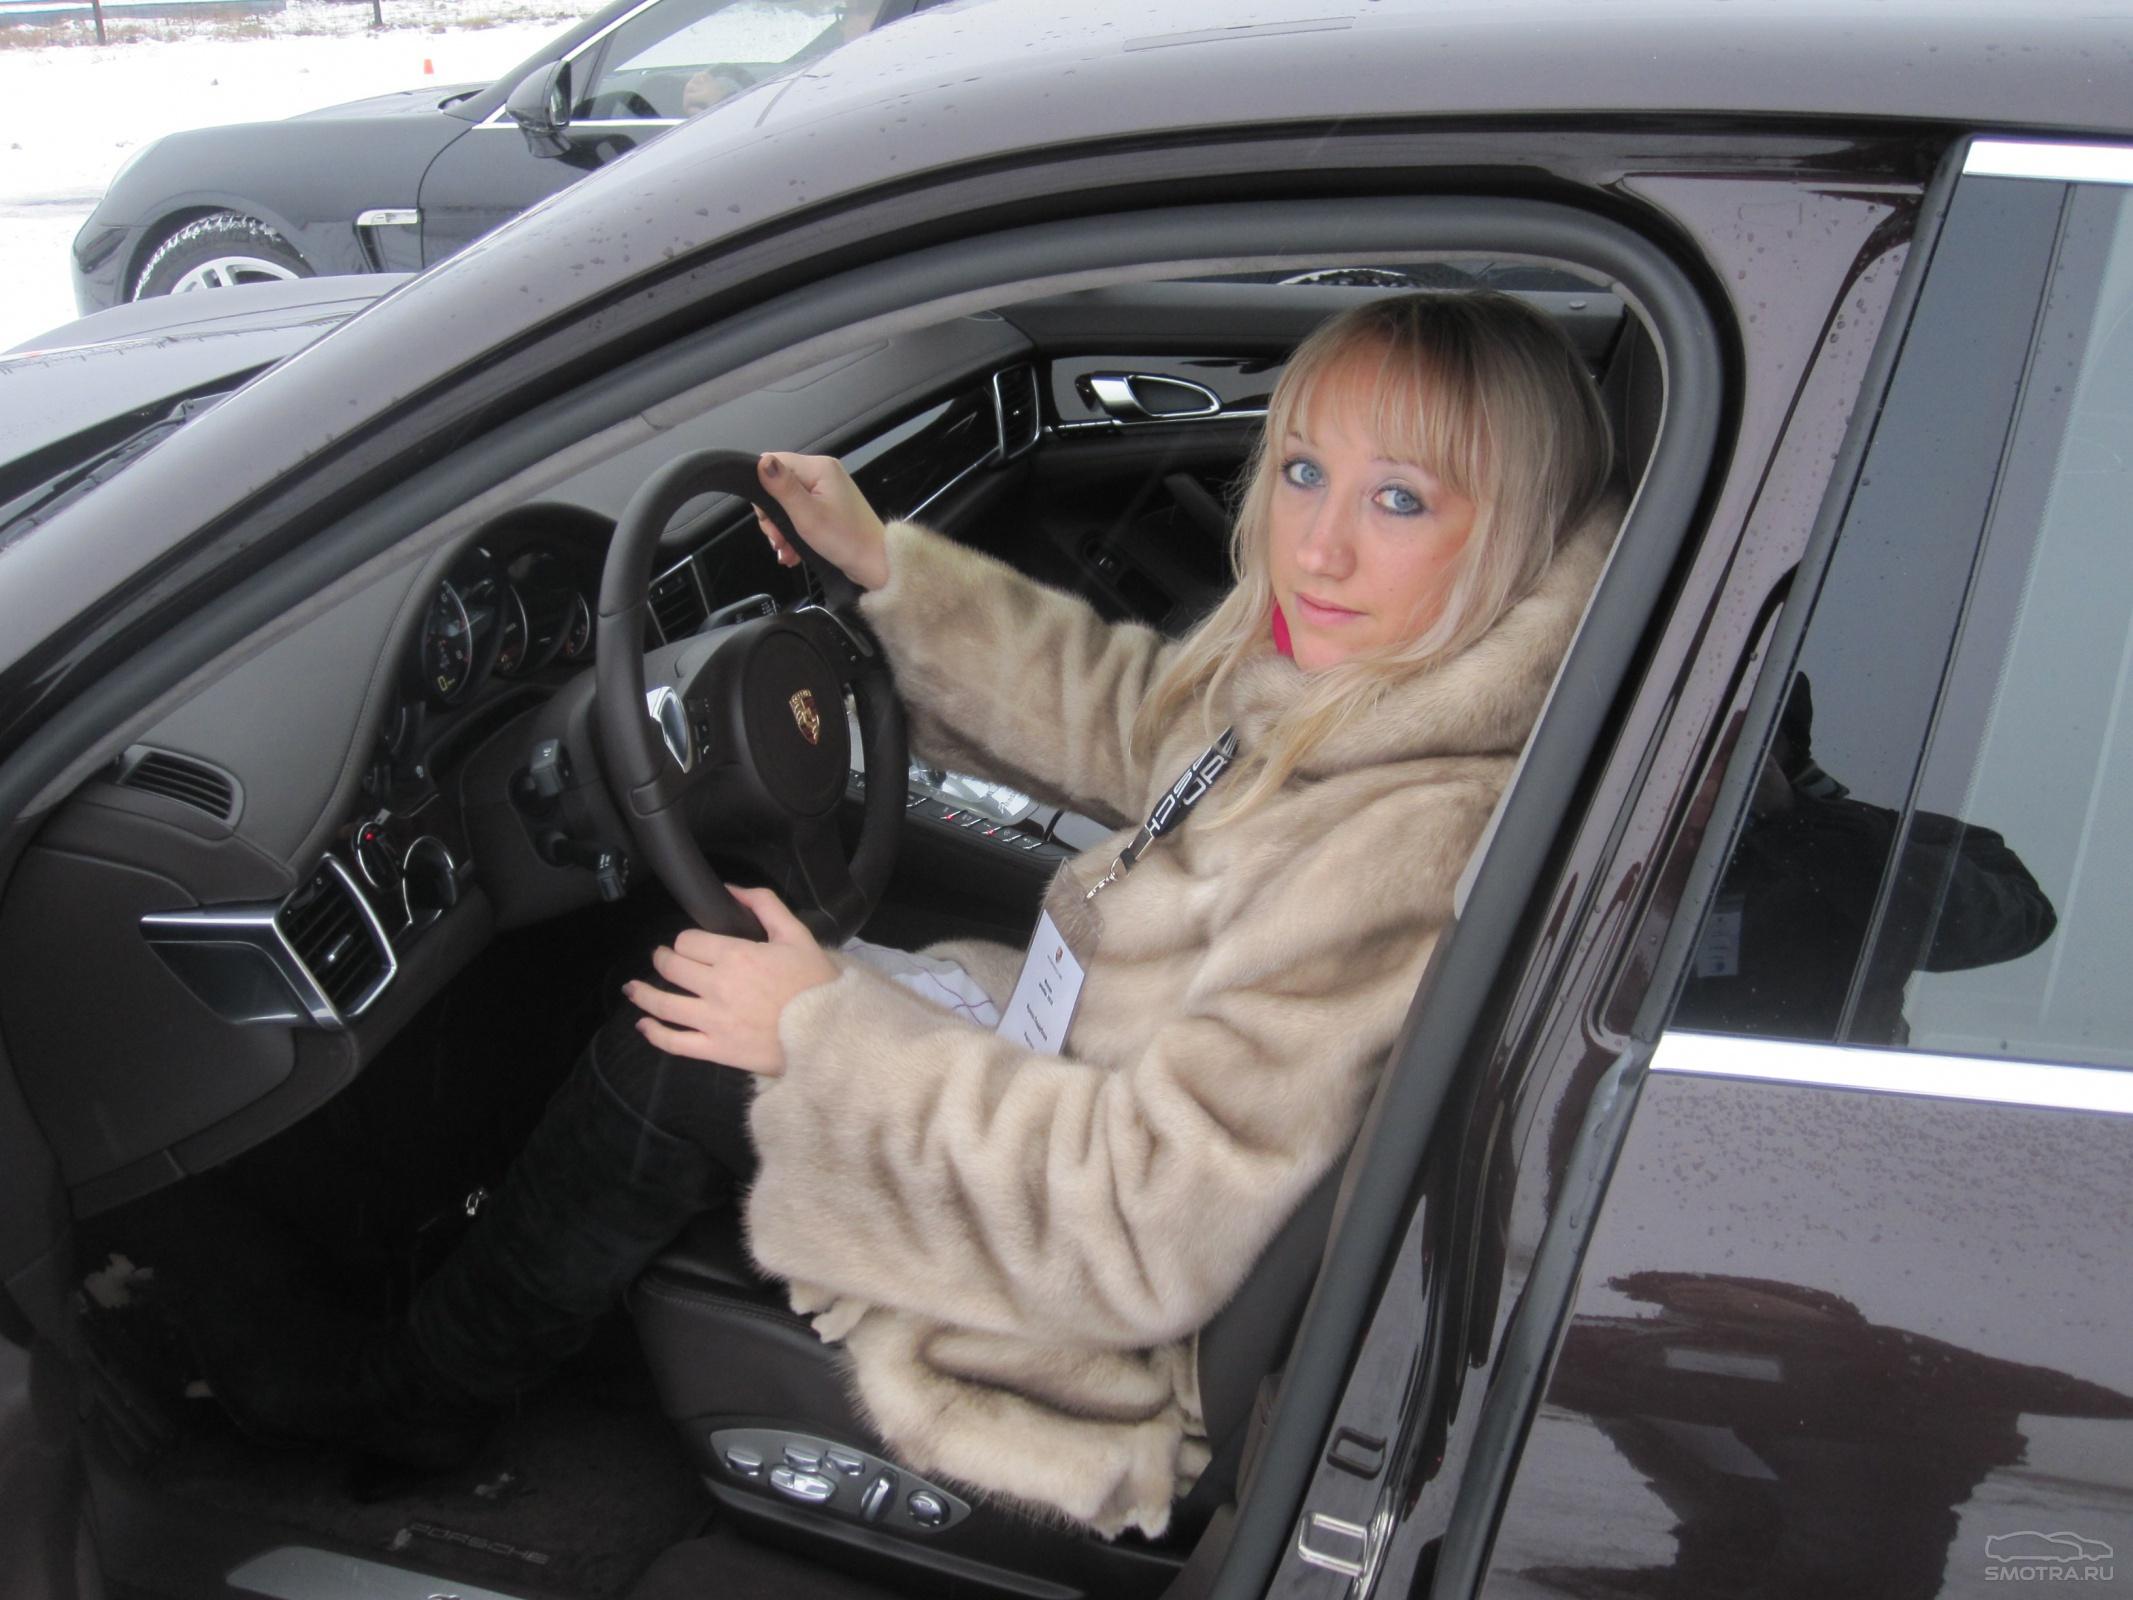 шлюхи дают в машине